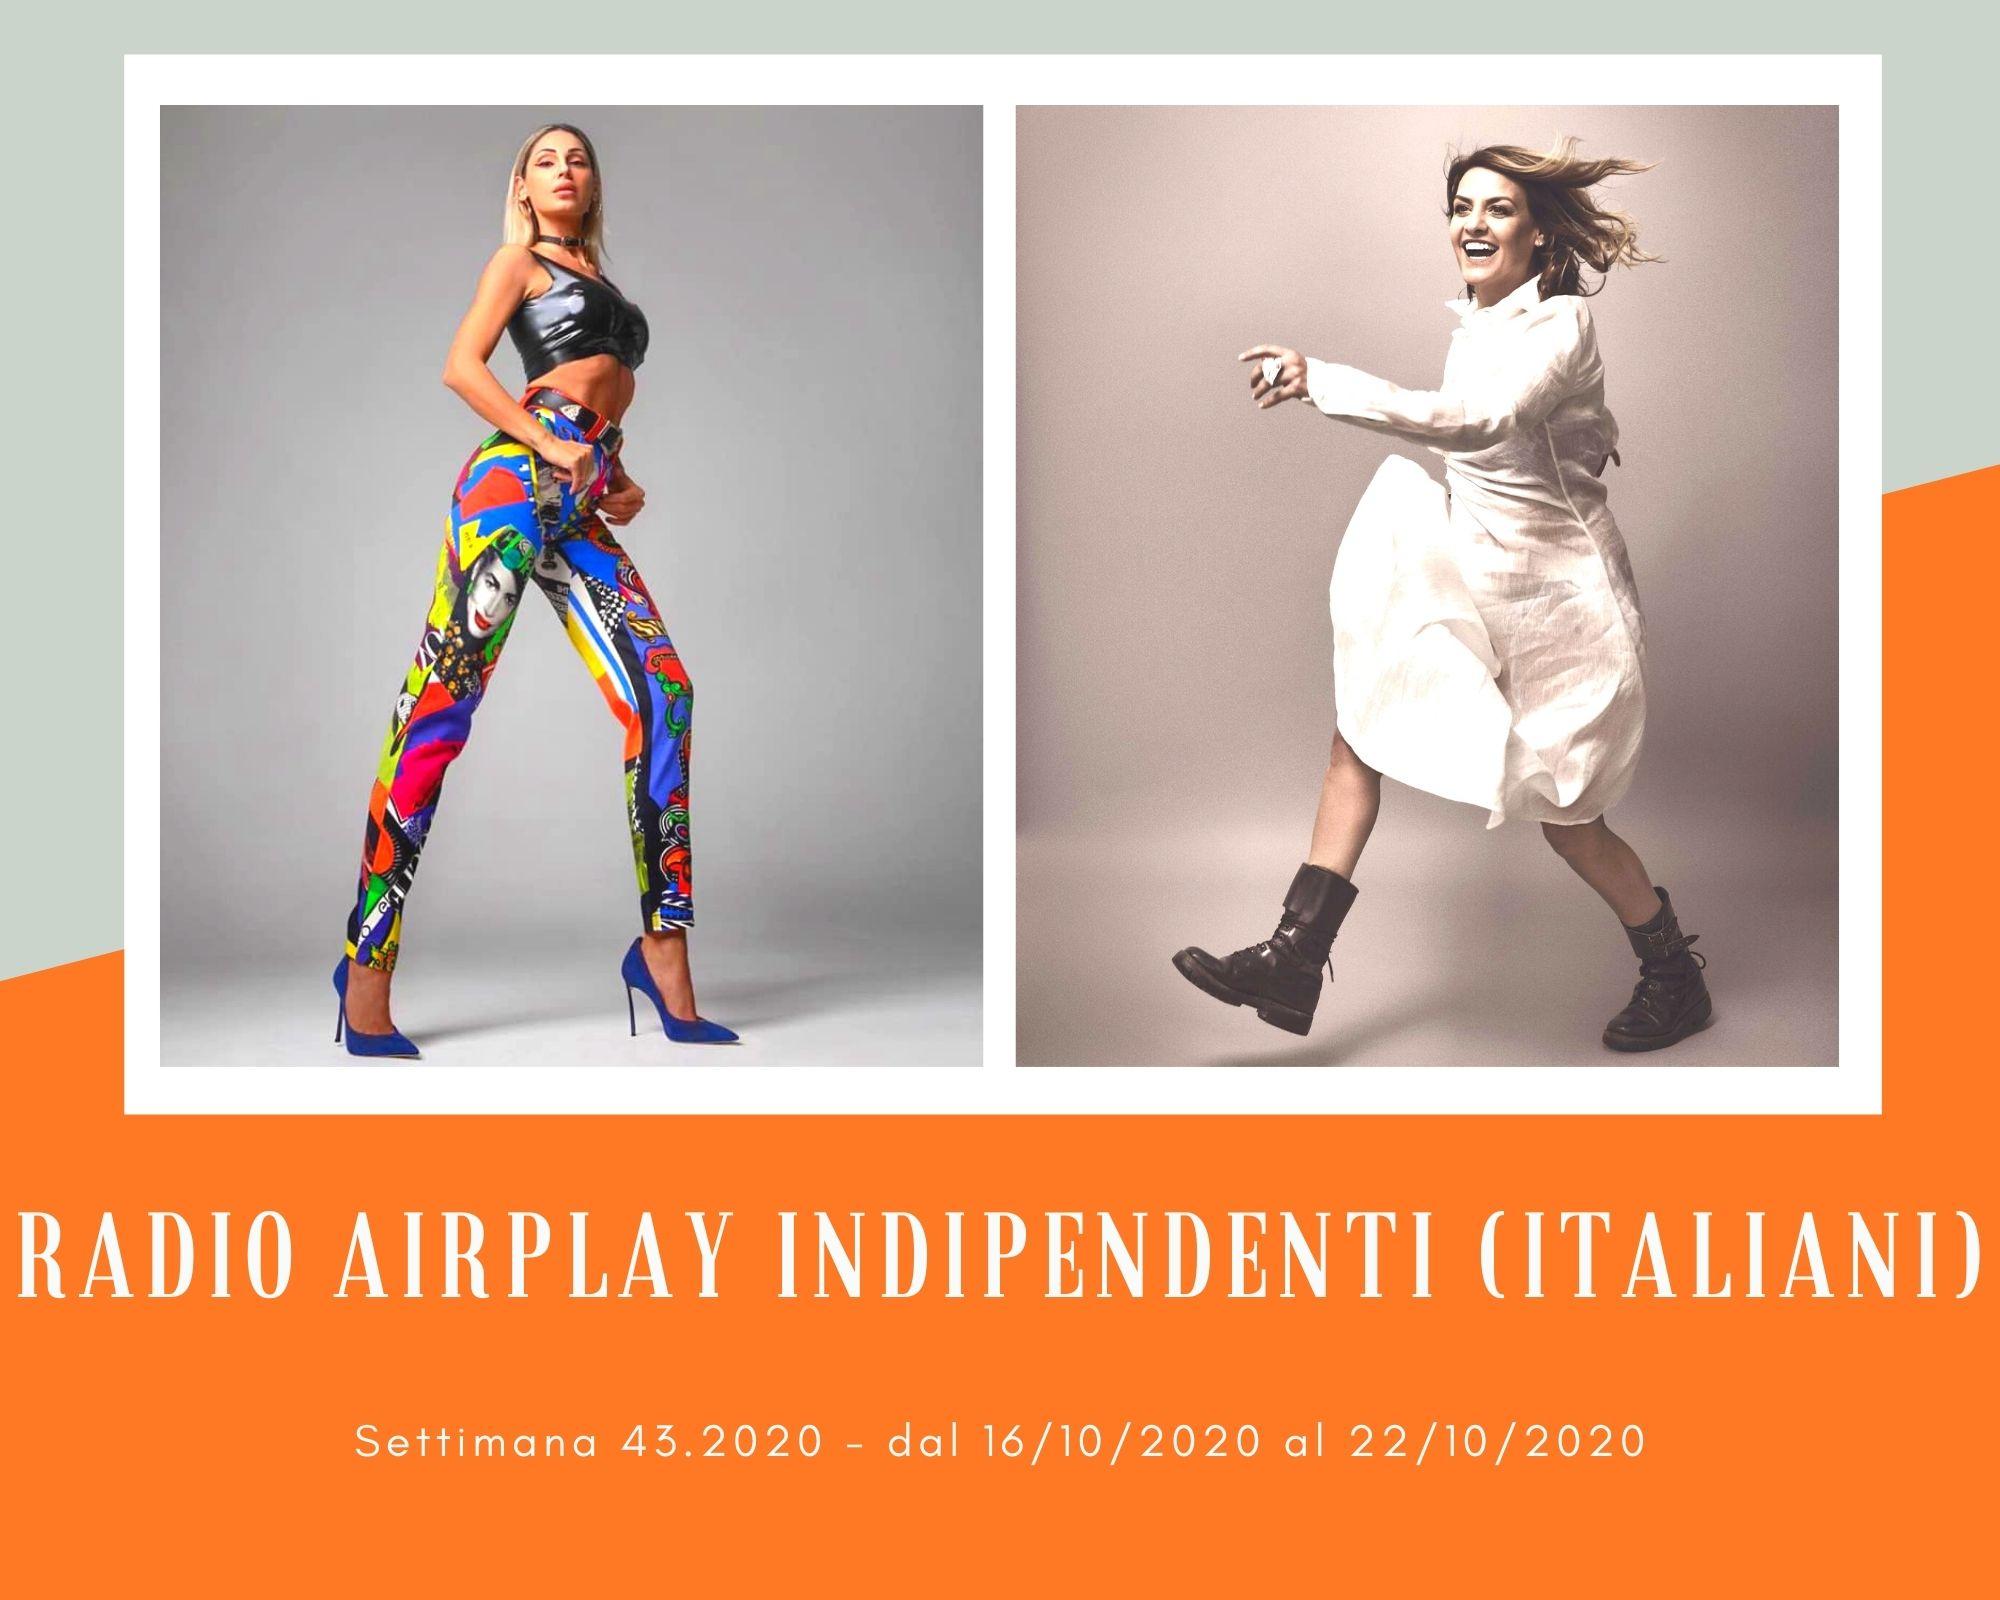 Classifica RADIO AIRPLAY Indipendenti Italiani, week 43. Anna Tatangelo entra in coppia. Francesco Gabbani fa tripletta, Irene Grandi doppietta